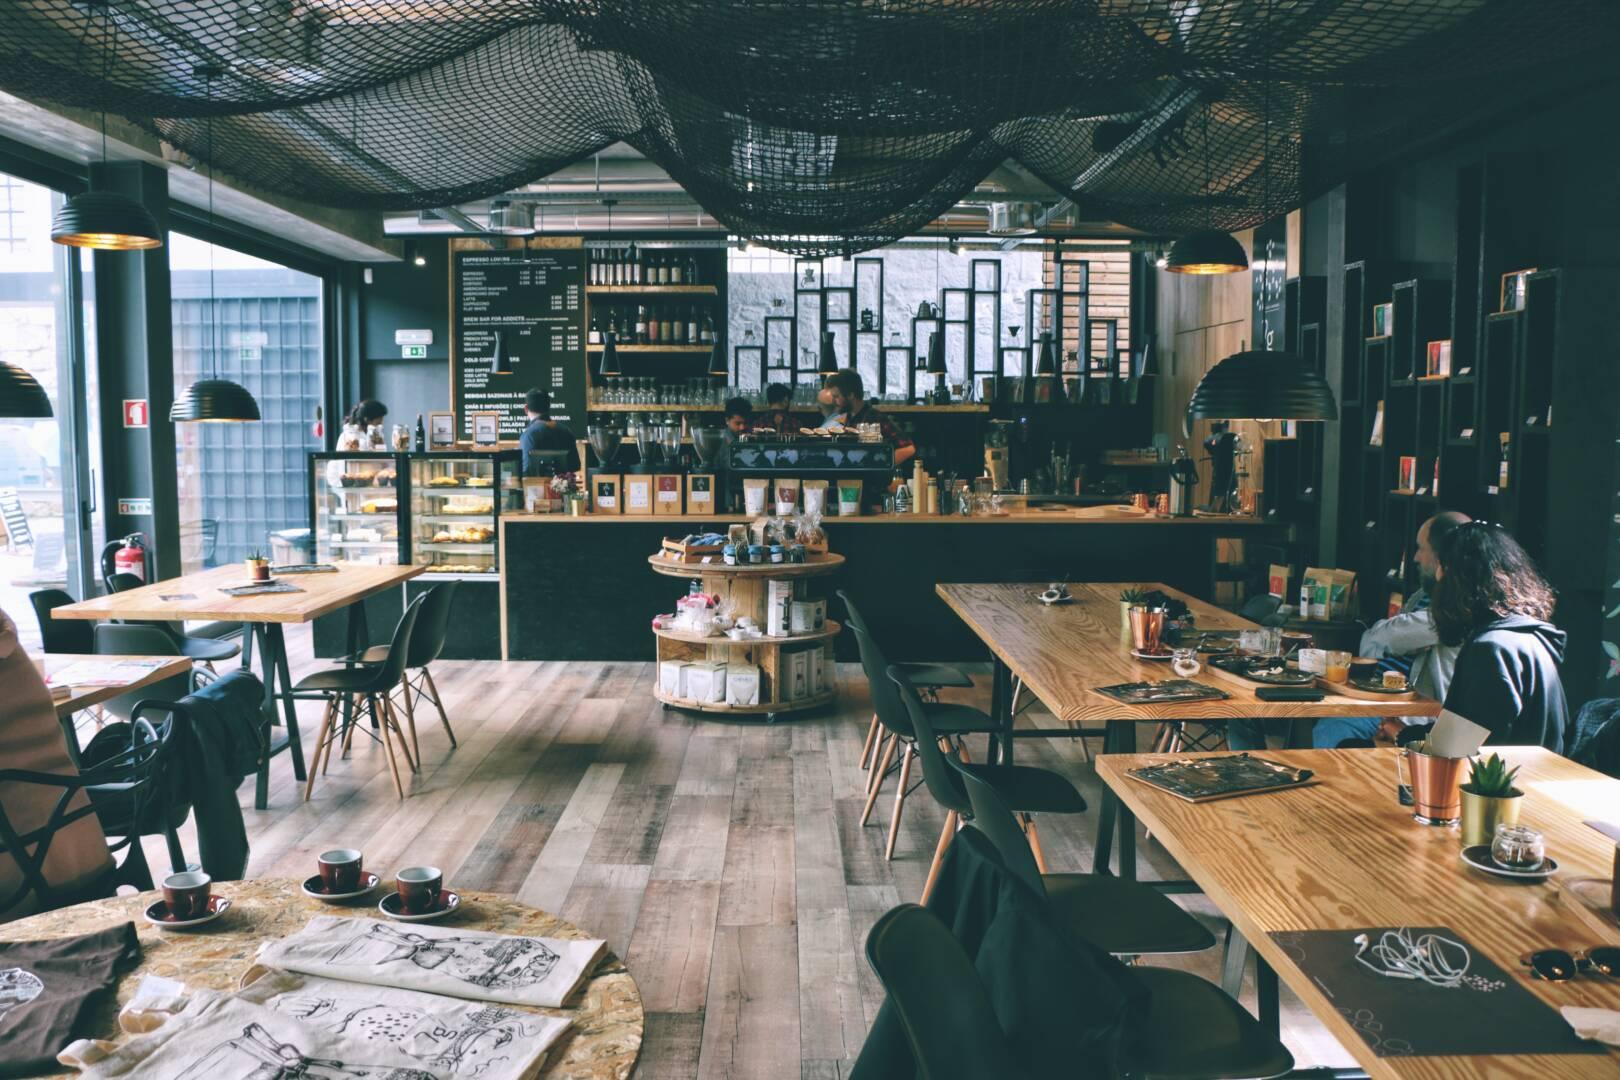 Kафе концепции